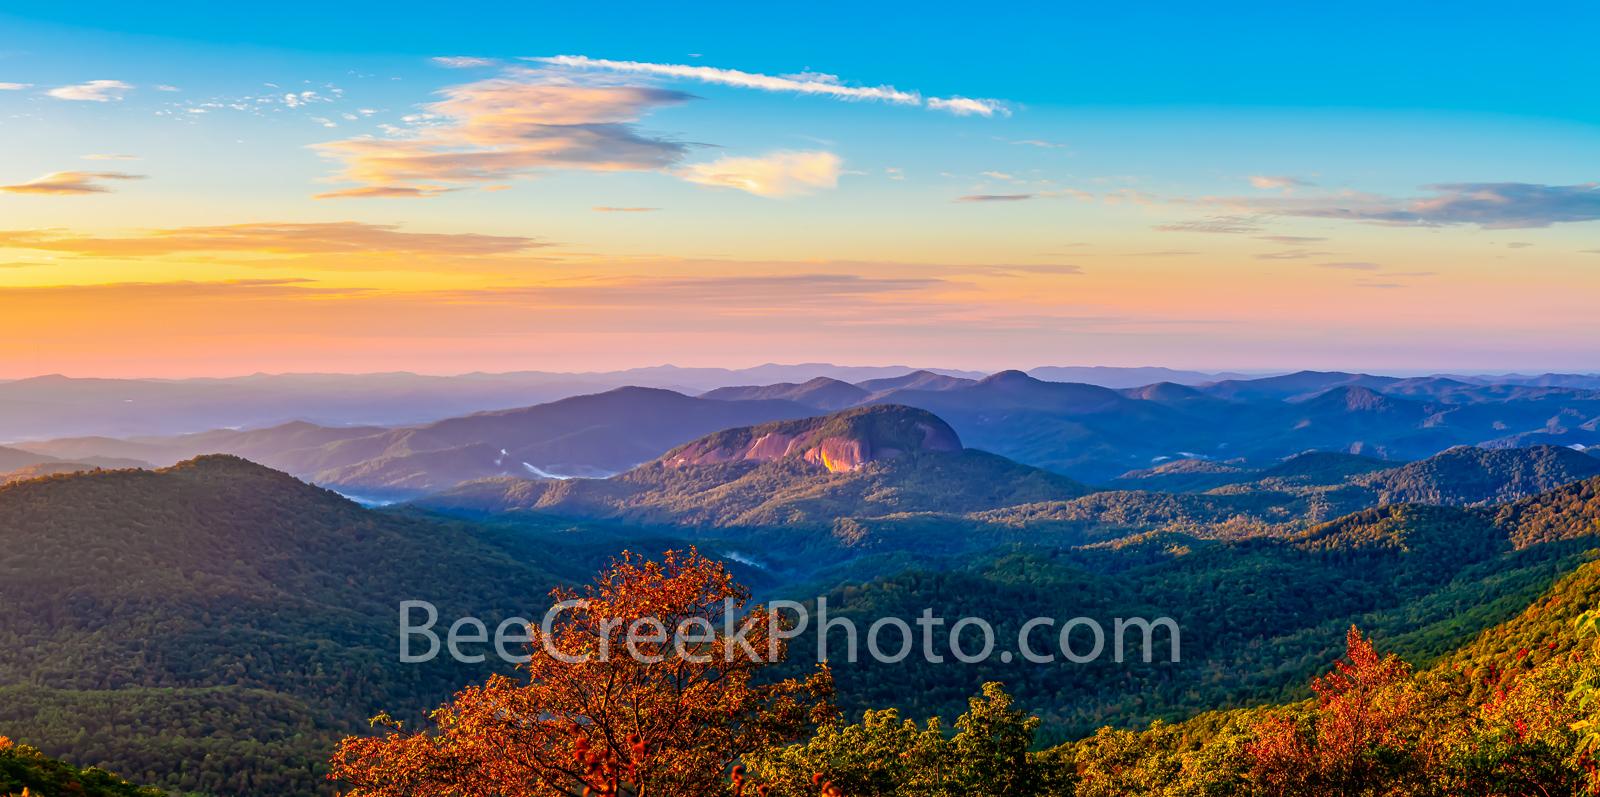 Smoky mountain, sunrise, tree, red, yellow, blue ridge parkway, overlook, valley, looking glass rock, blue ridge mountains, NC, Smoky Mountains National Park, scenic, autumn, vacation, travel, destina, photo